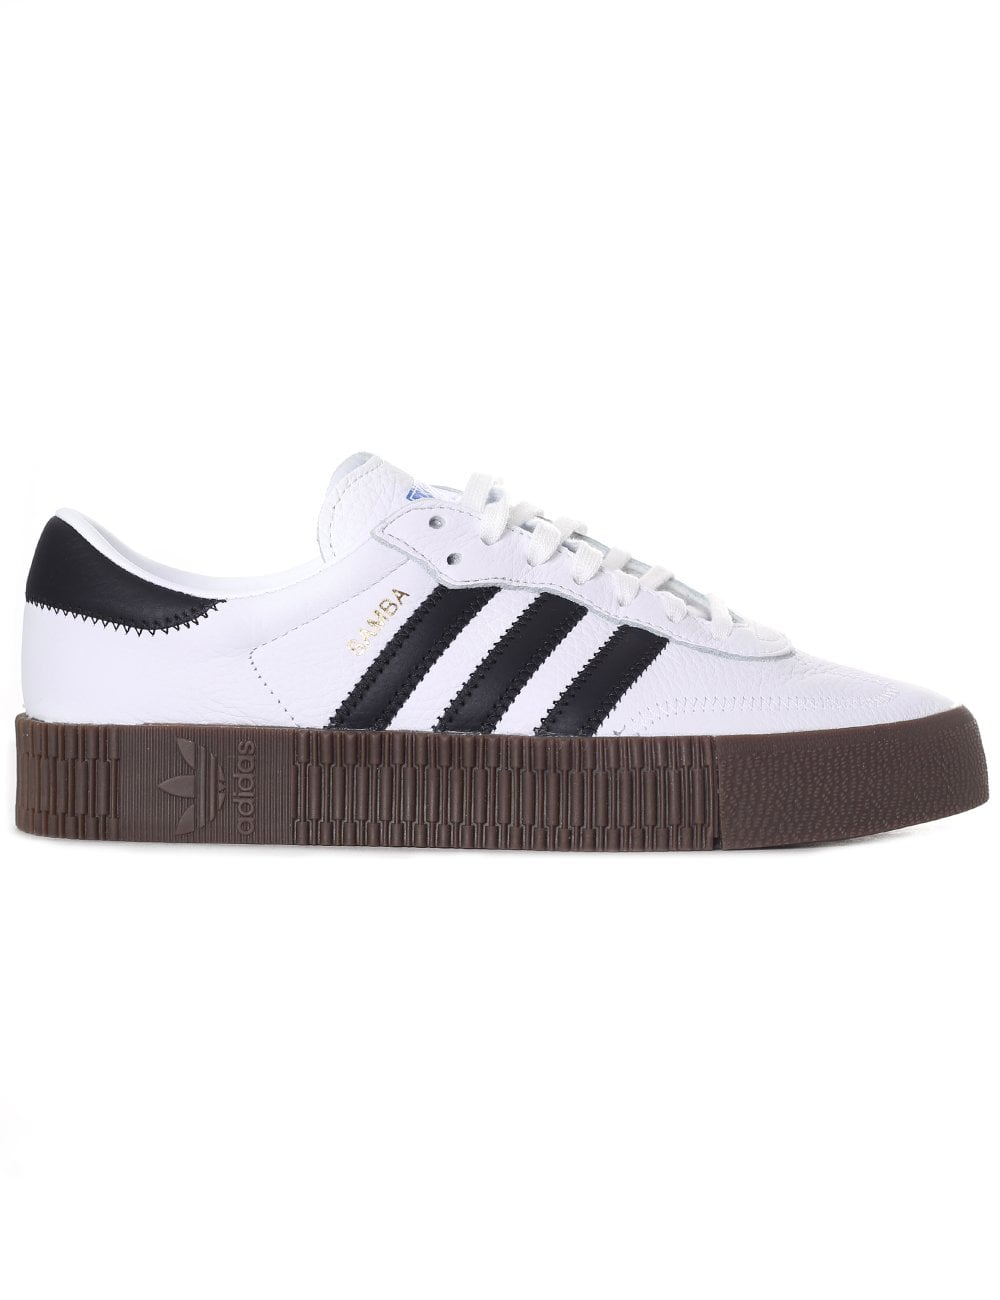 adidas womens samba trainers Sale